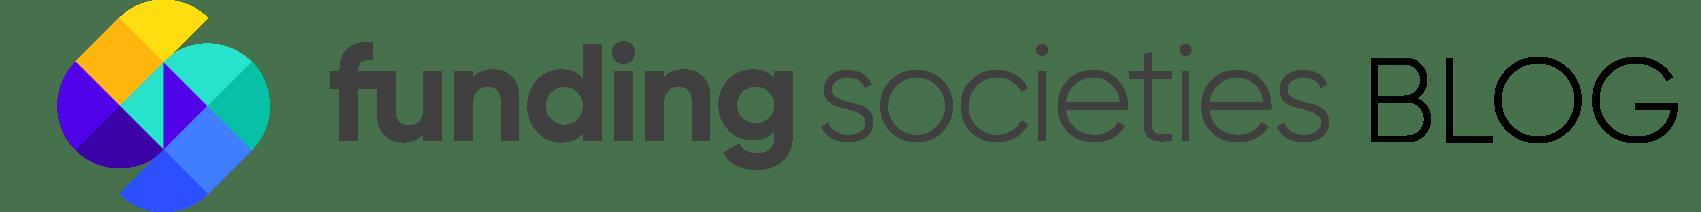 Funding Societies Thailand Blog